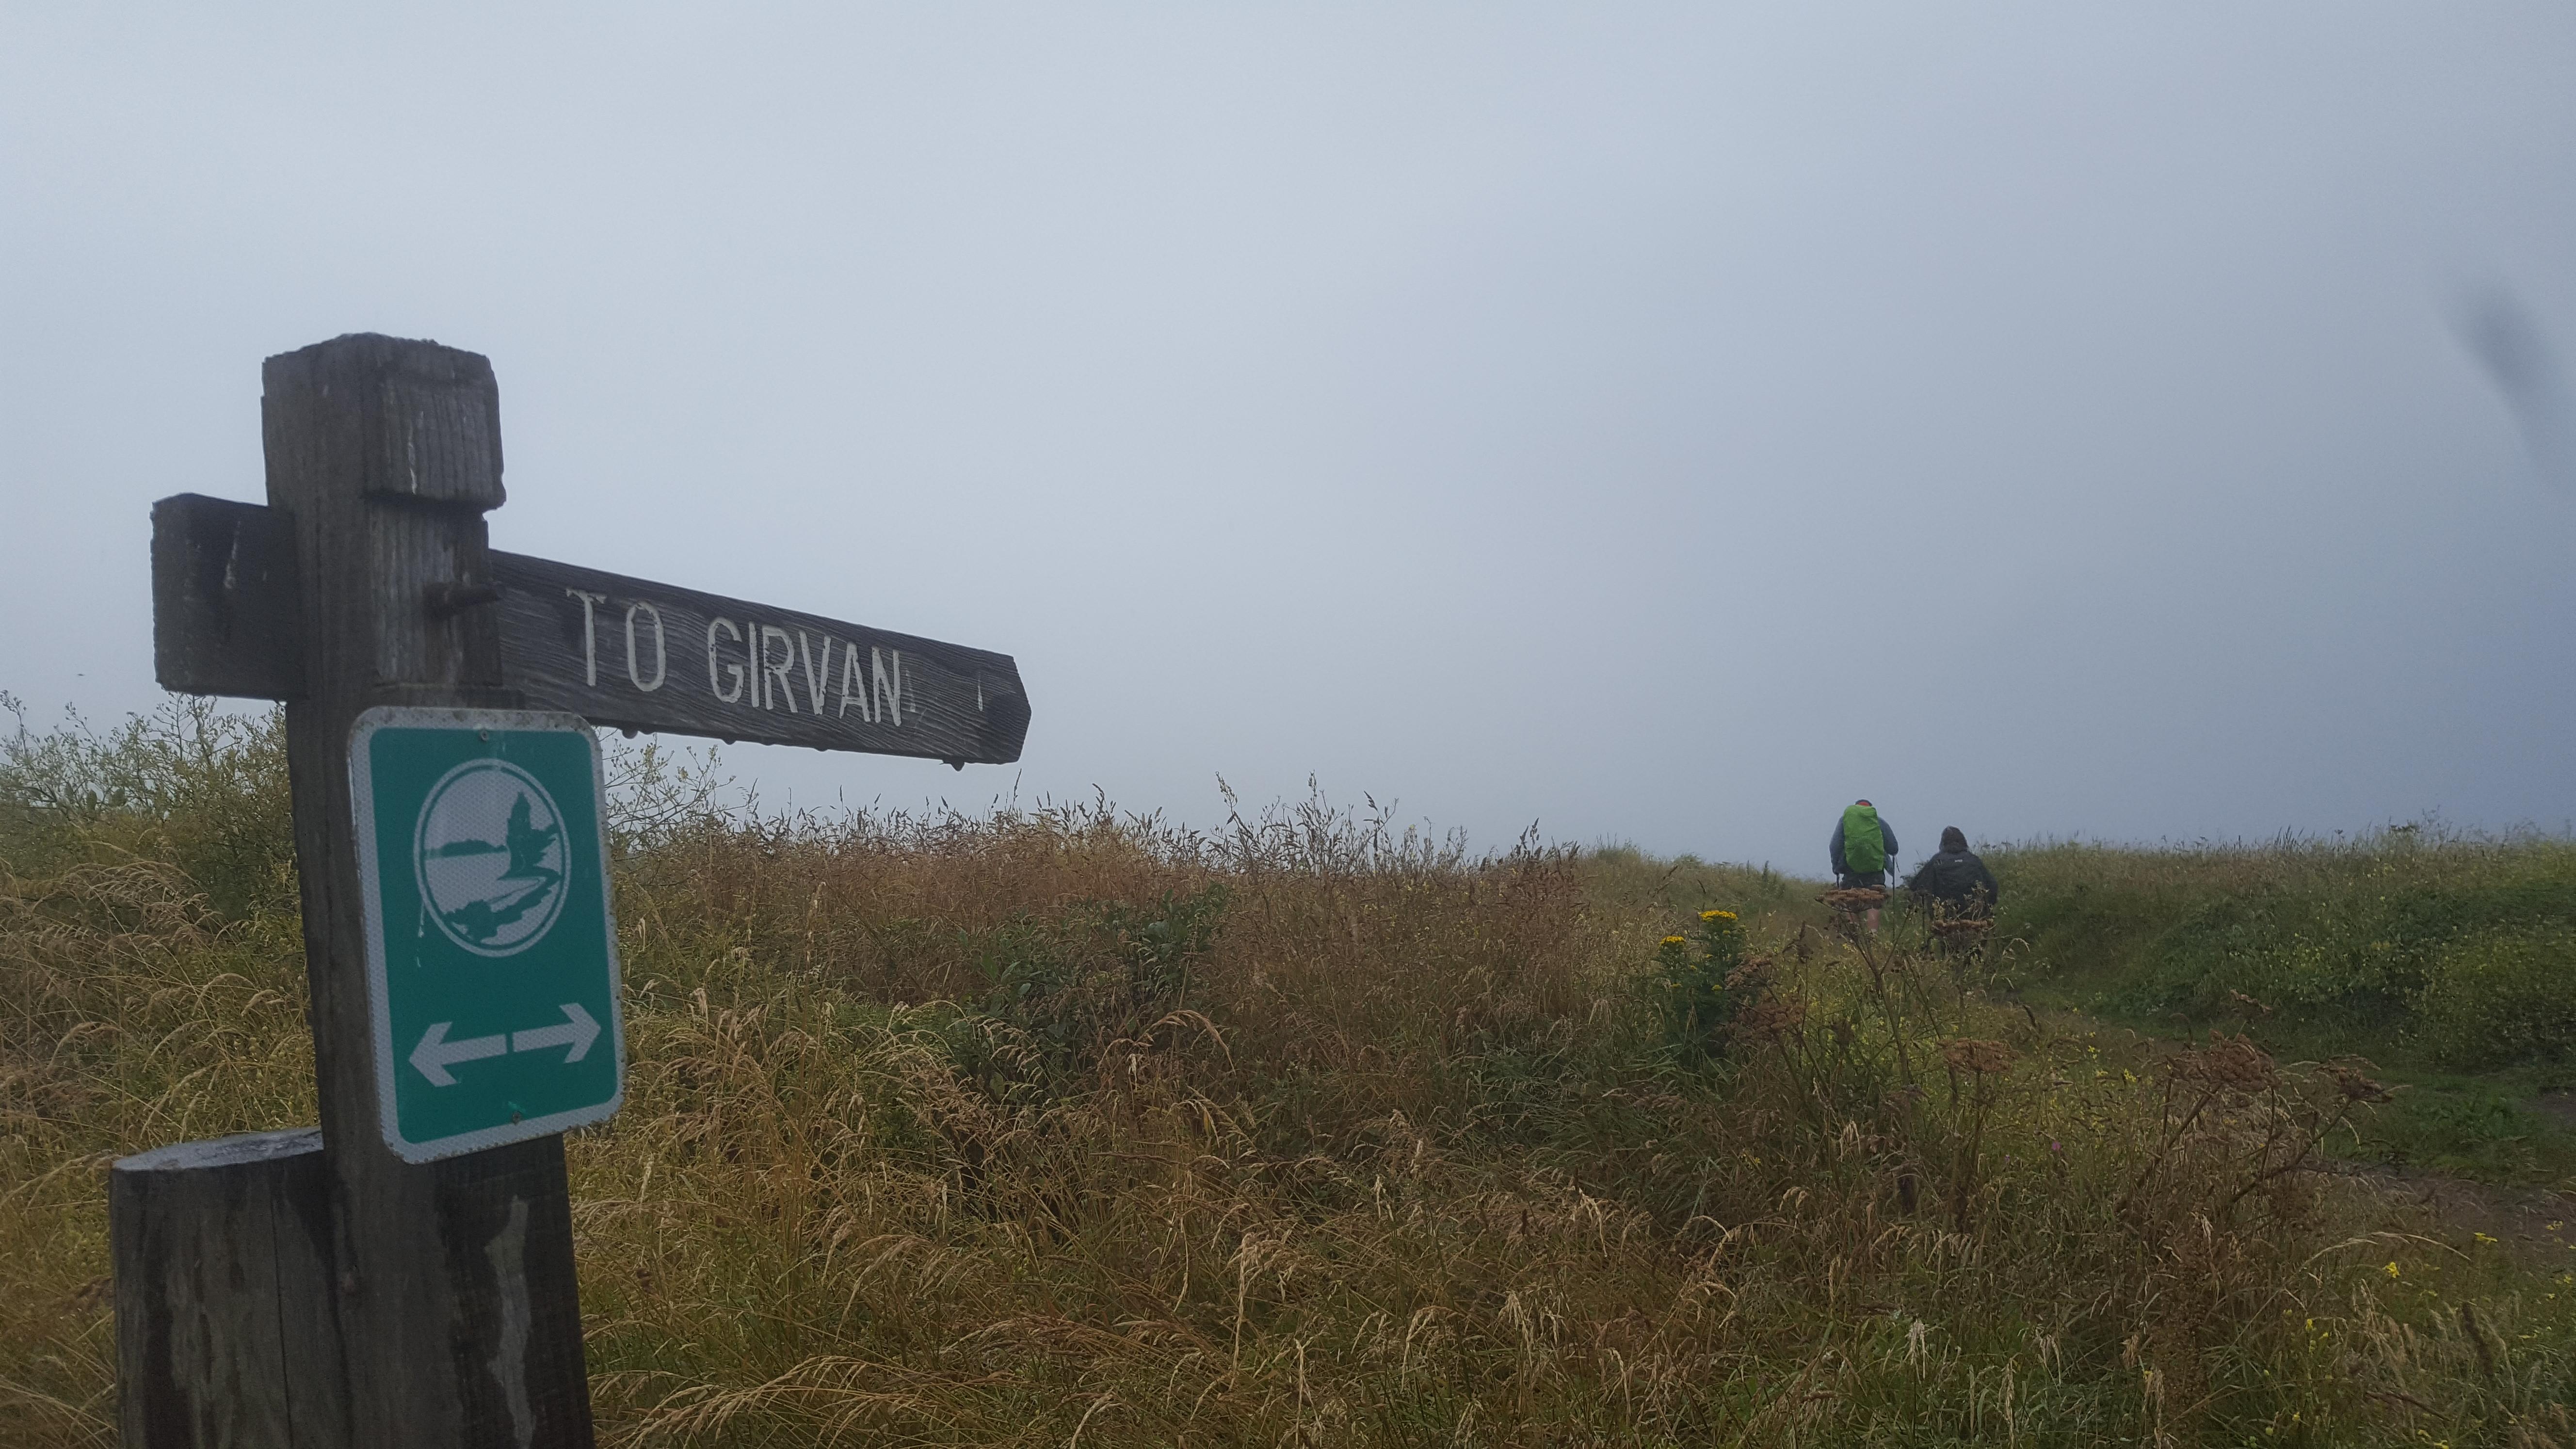 to Girvan sign in rain